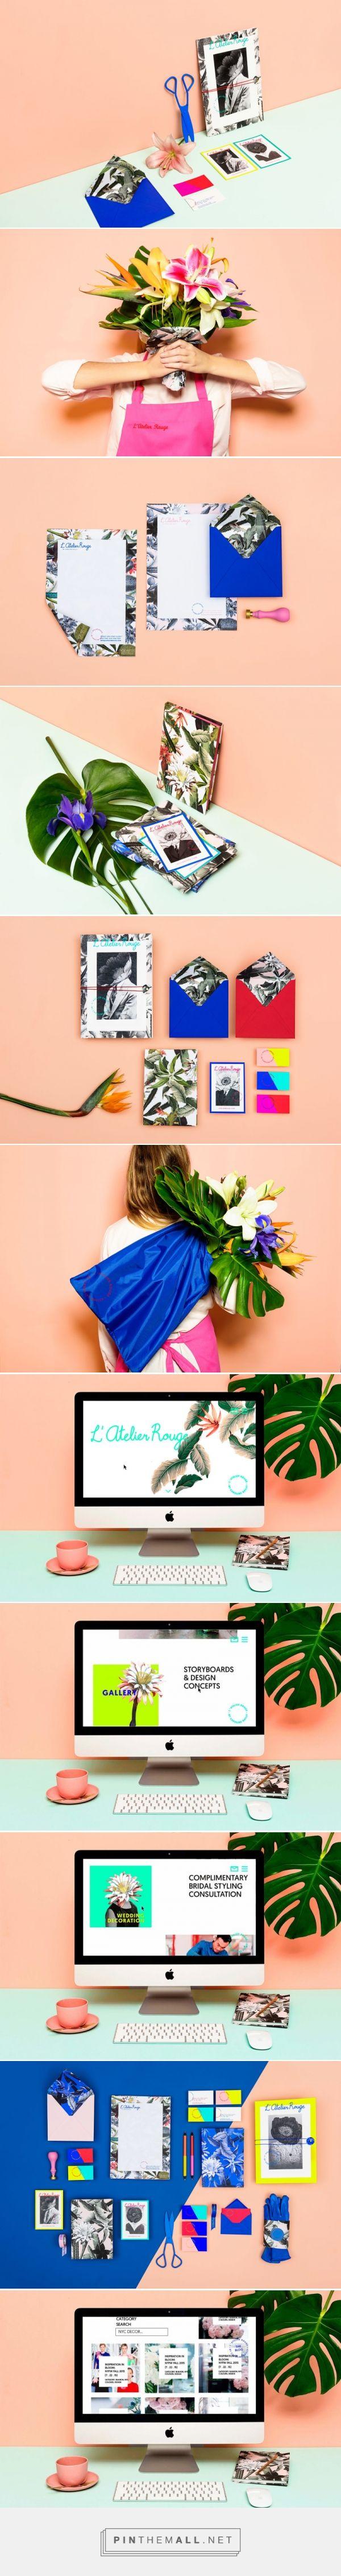 Masquespacio - L'Atelier Rouge Rebranding + Web Design | Trendland - created via https://pinthemall.net